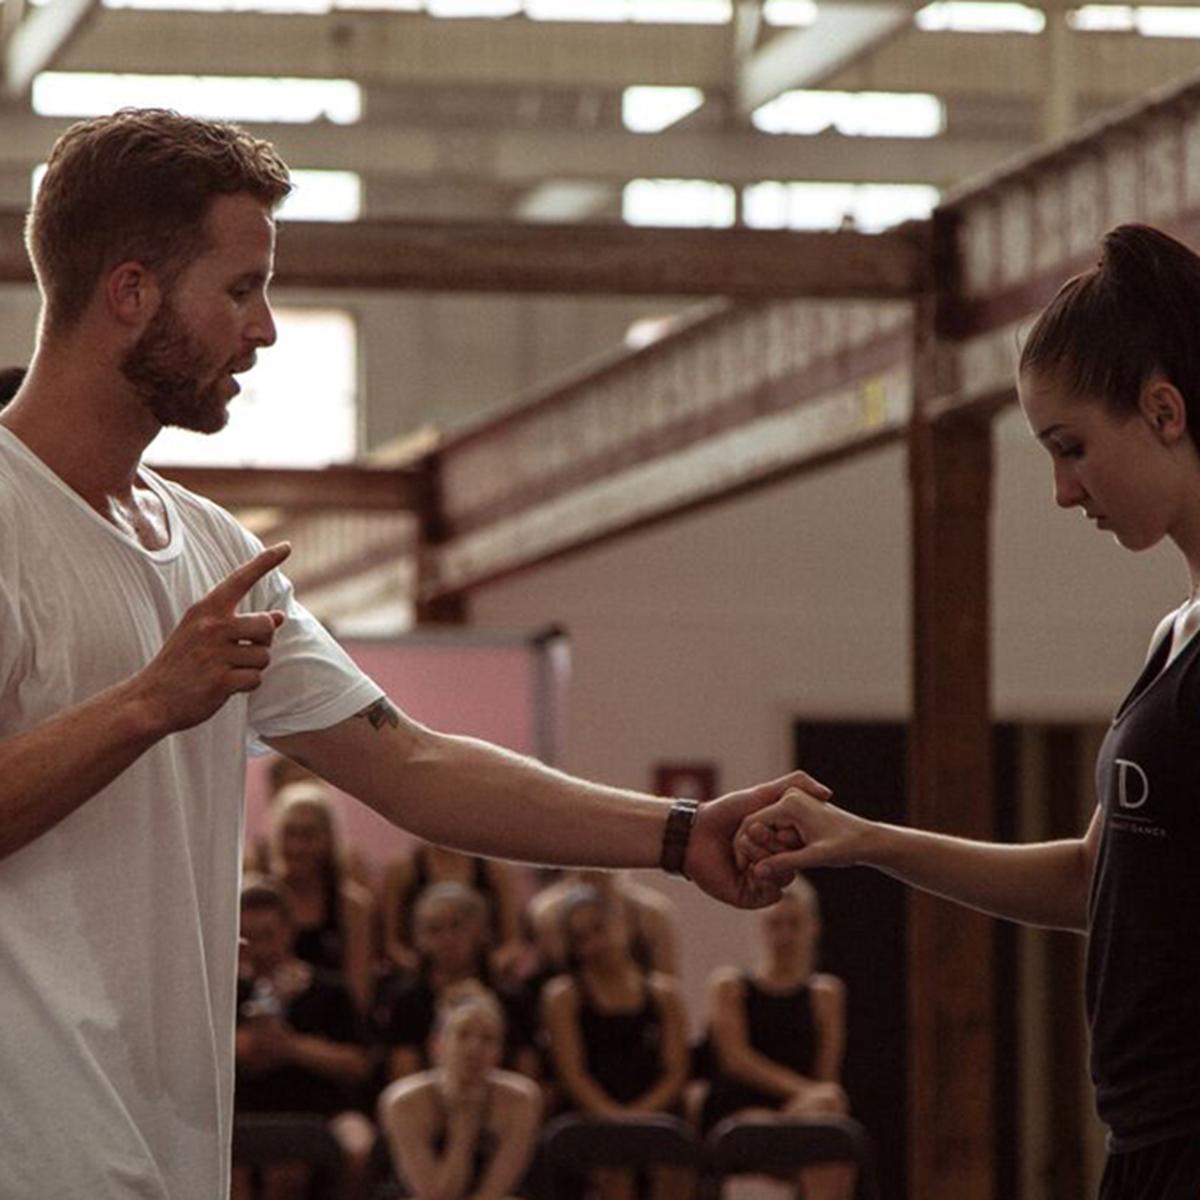 Pathways to Teaching: The Australian dance teaching industry